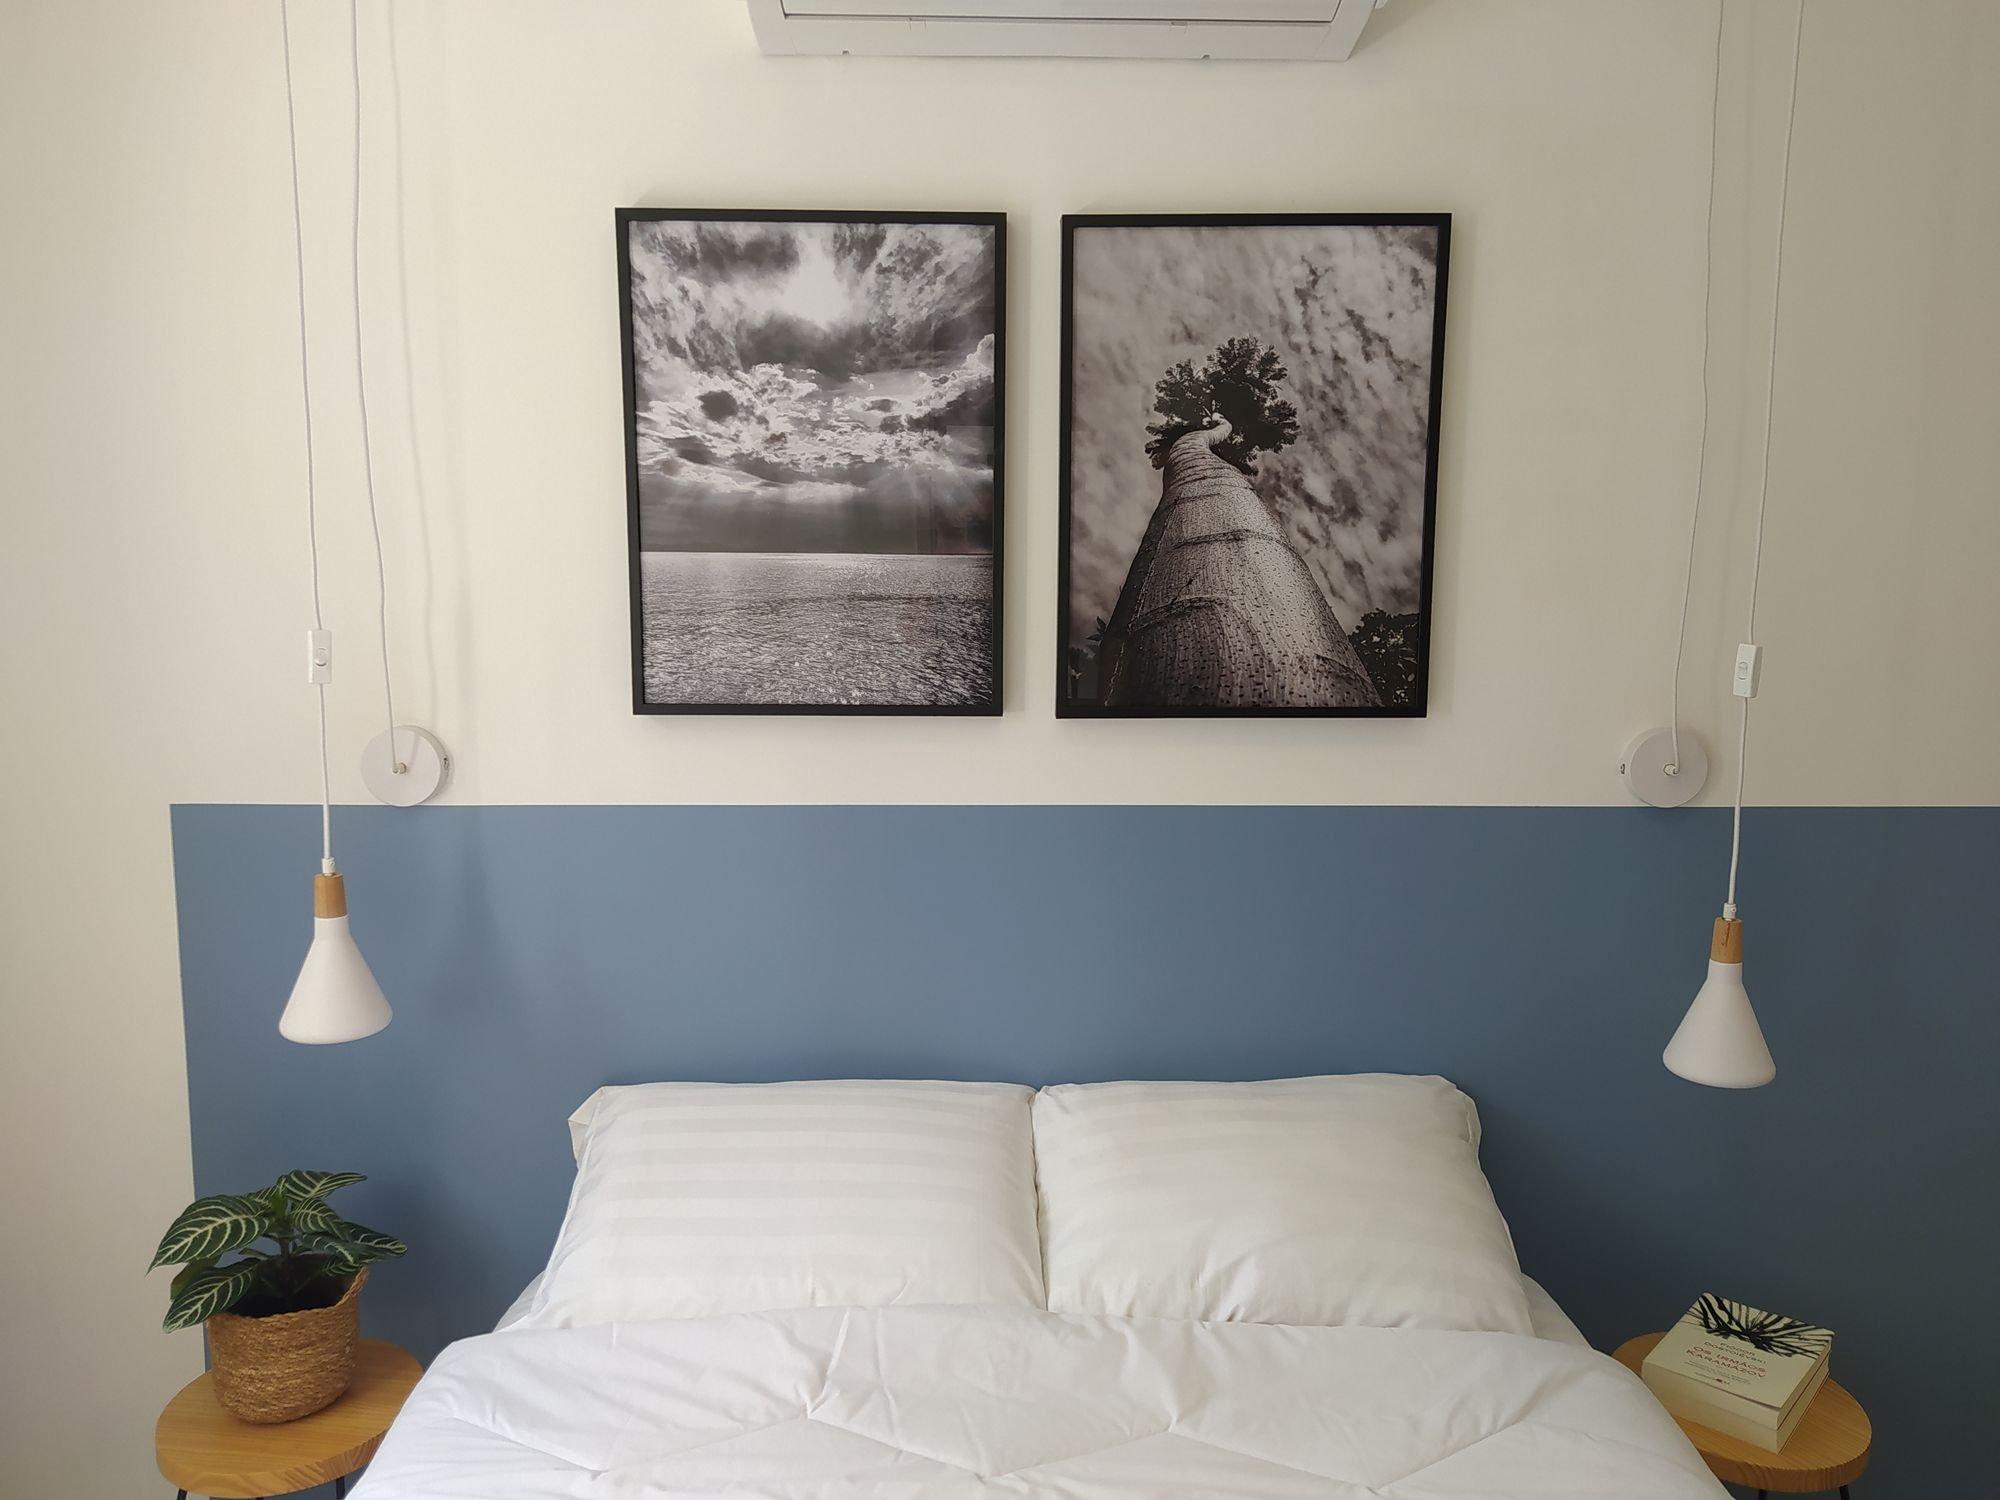 Foto de Quarto com cama, vaso de planta